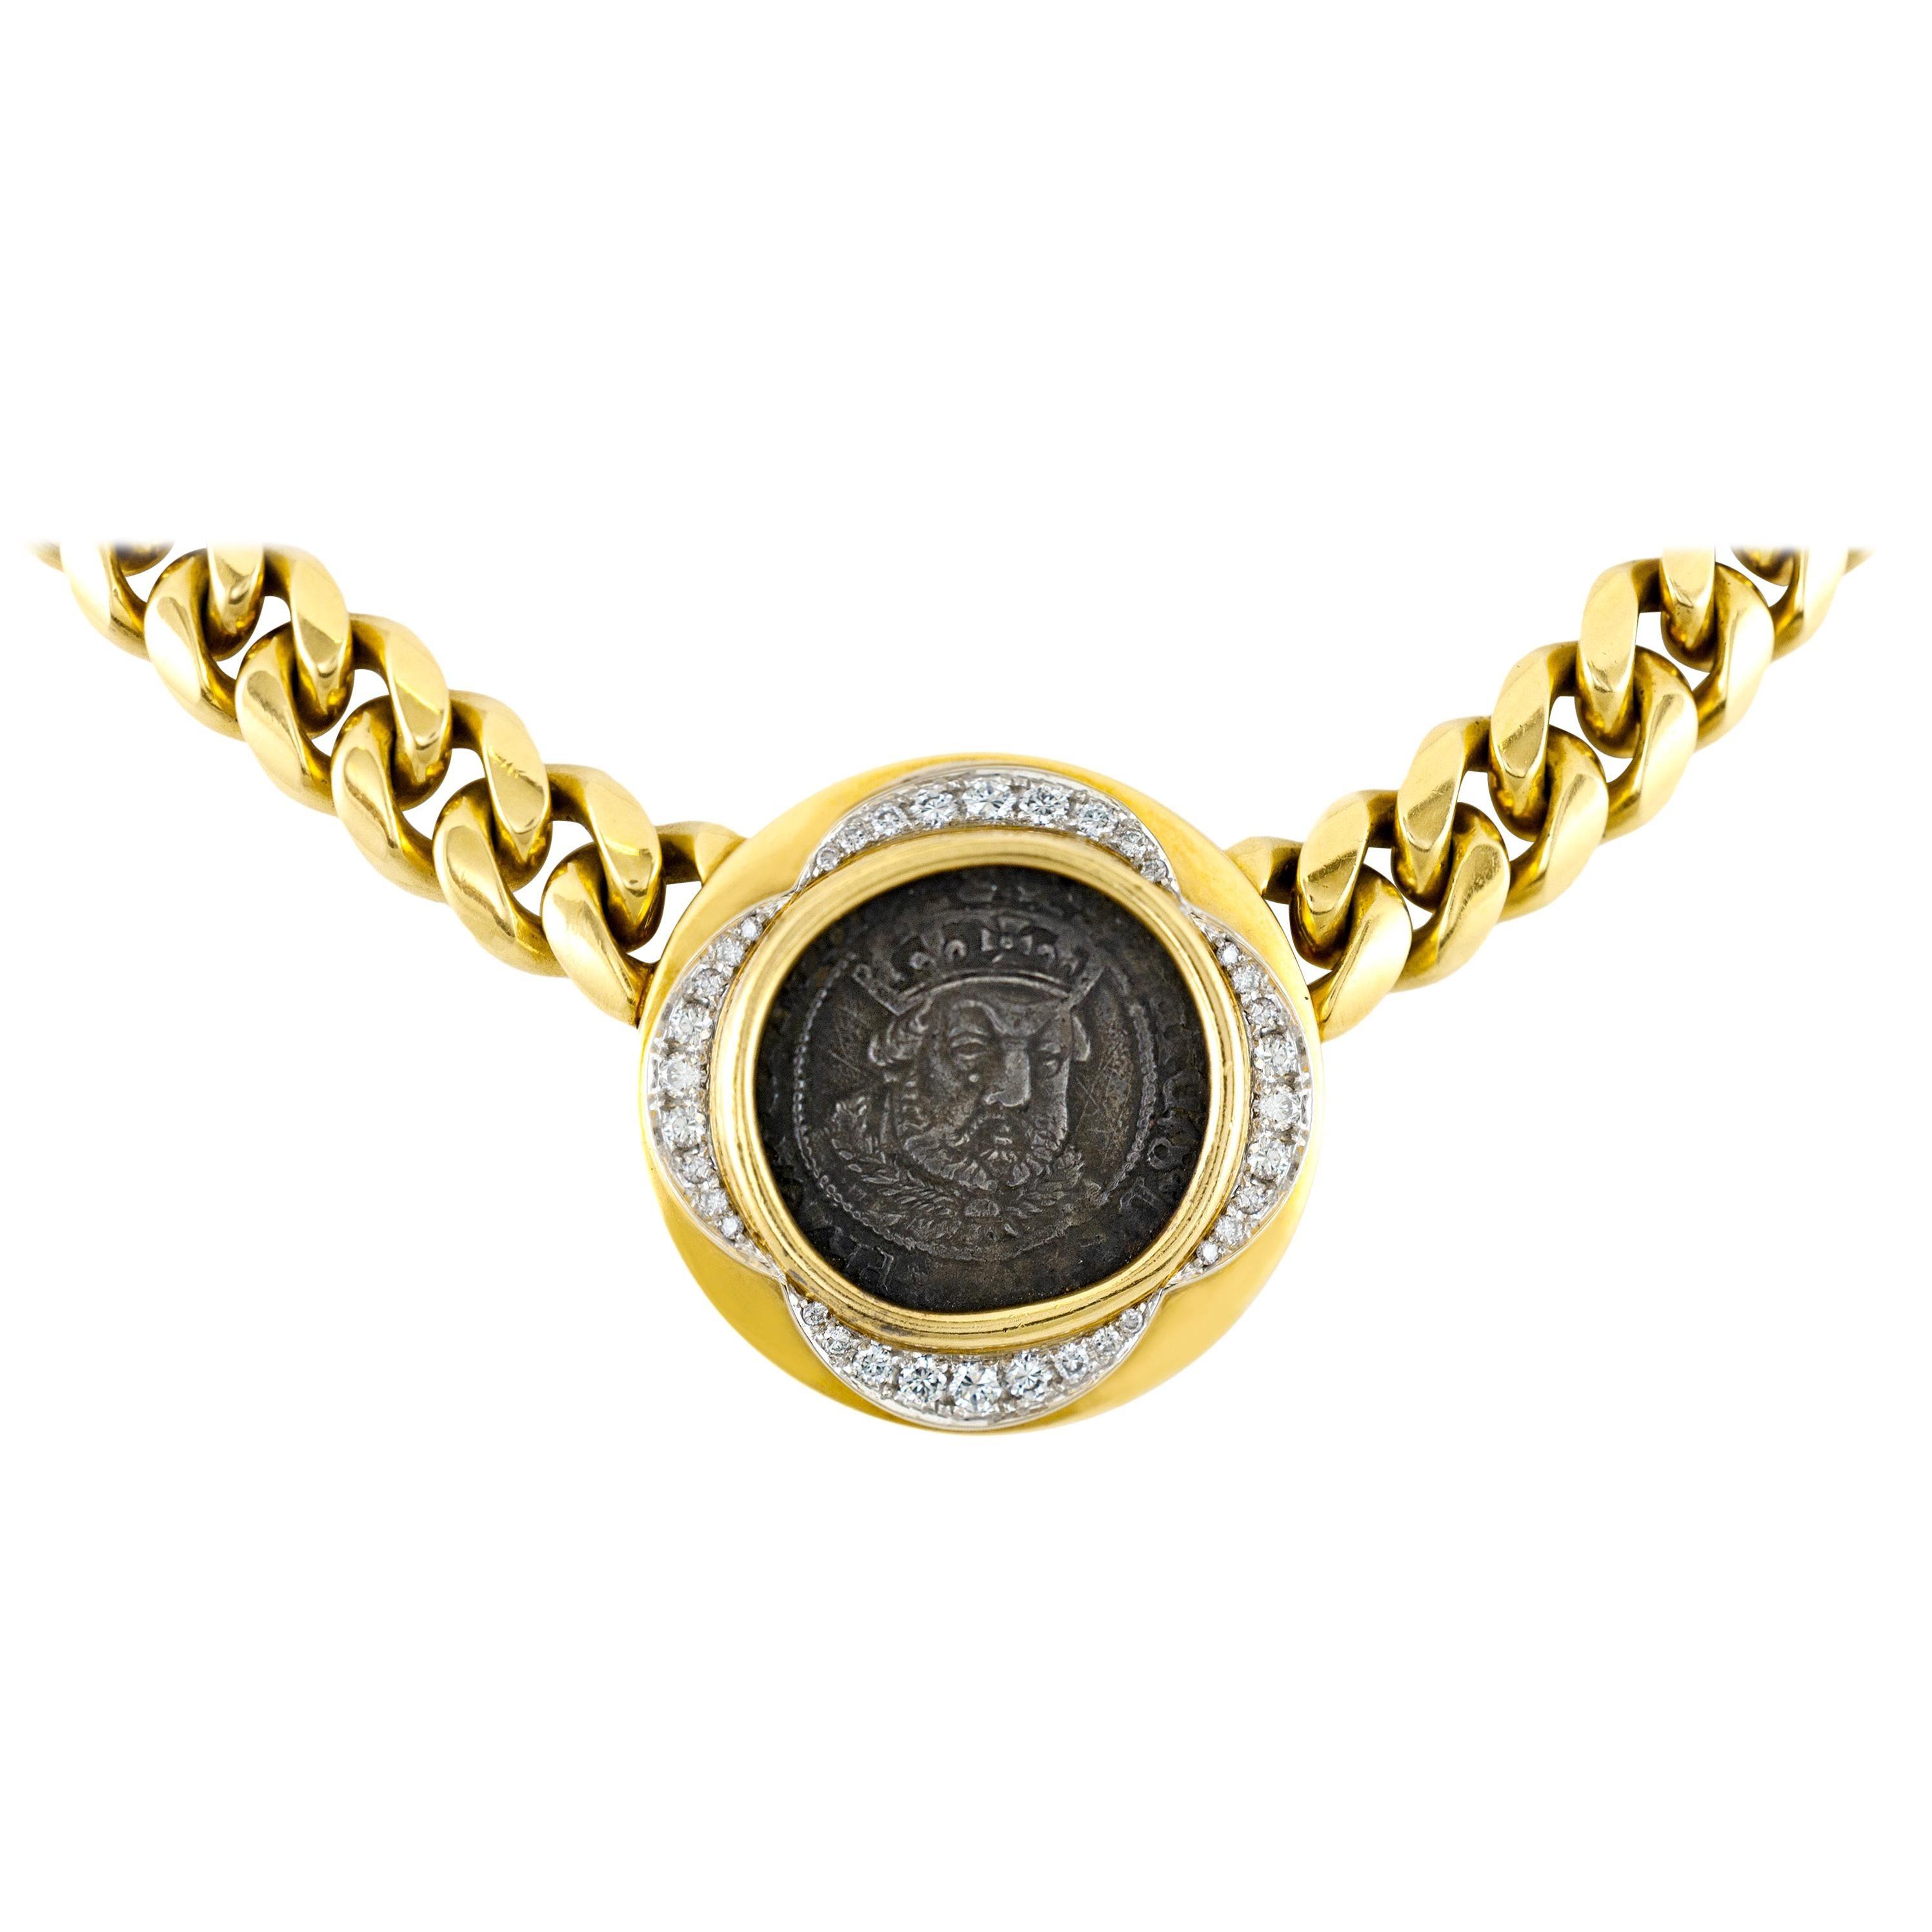 Bvlgari 18 Karat Henry VII Coin with Diamonds Necklace